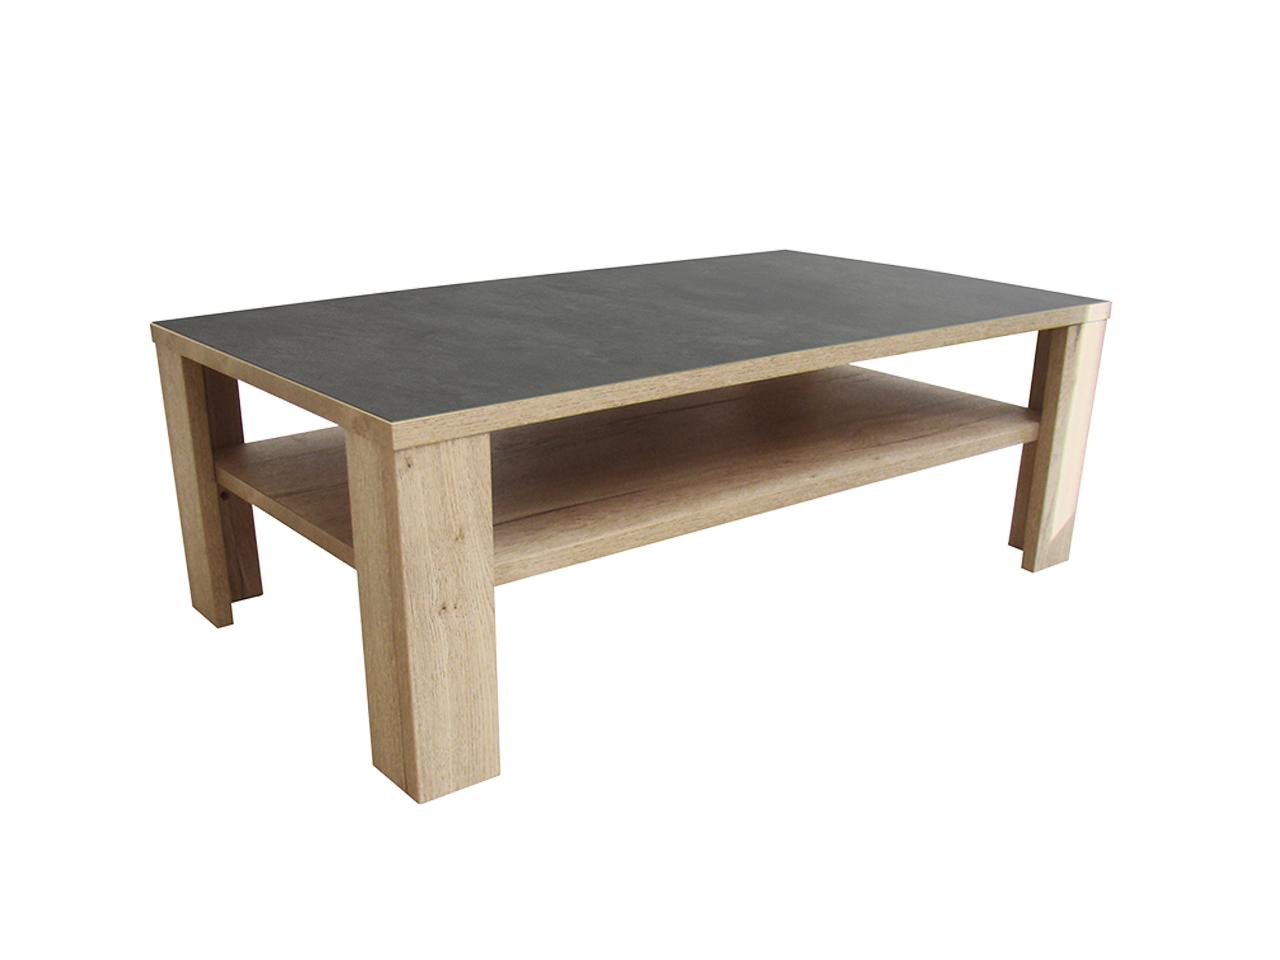 table basse himalaya pieds bois ch ne blanc ceram gris. Black Bedroom Furniture Sets. Home Design Ideas